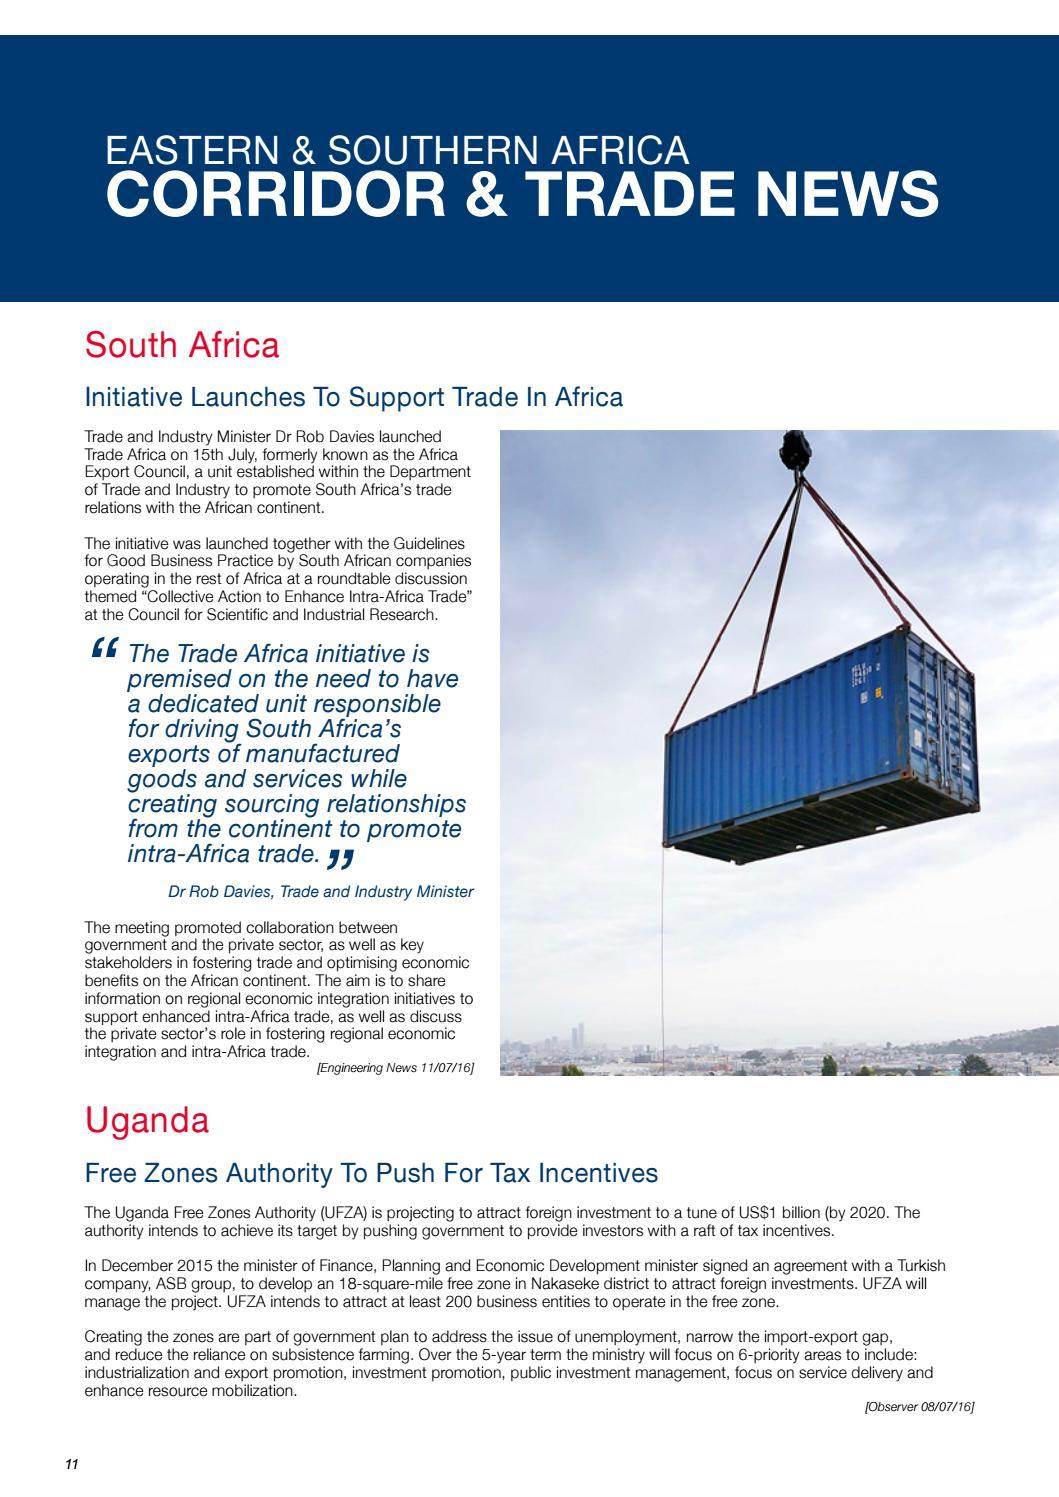 CMA CGM CTBL-Watch Africa - Issue 31 - July 2016 by CMA CGM Group